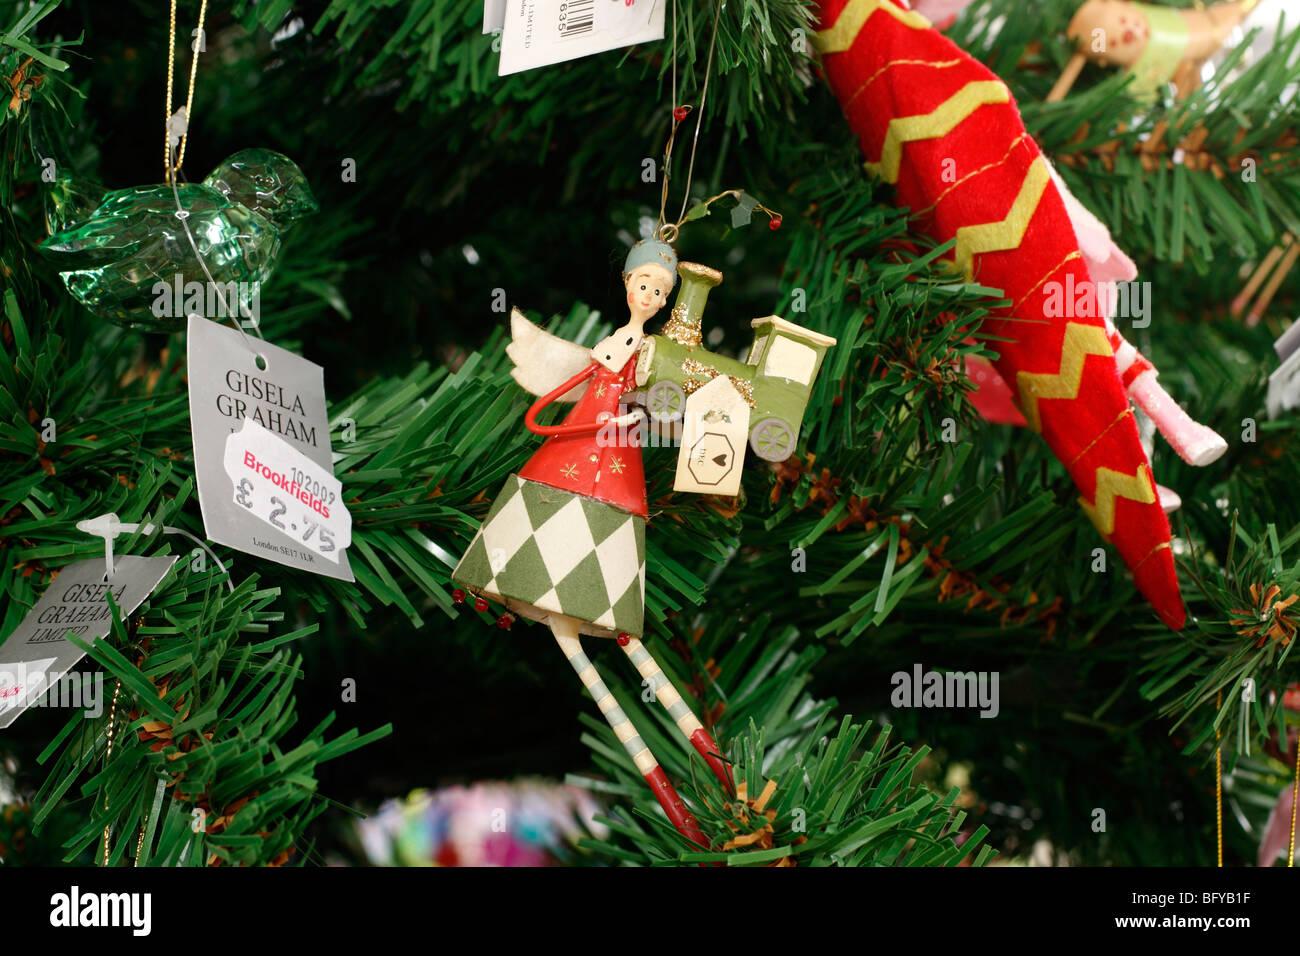 Gisela Graham Christmas Bells Hanging Decoration Ornament